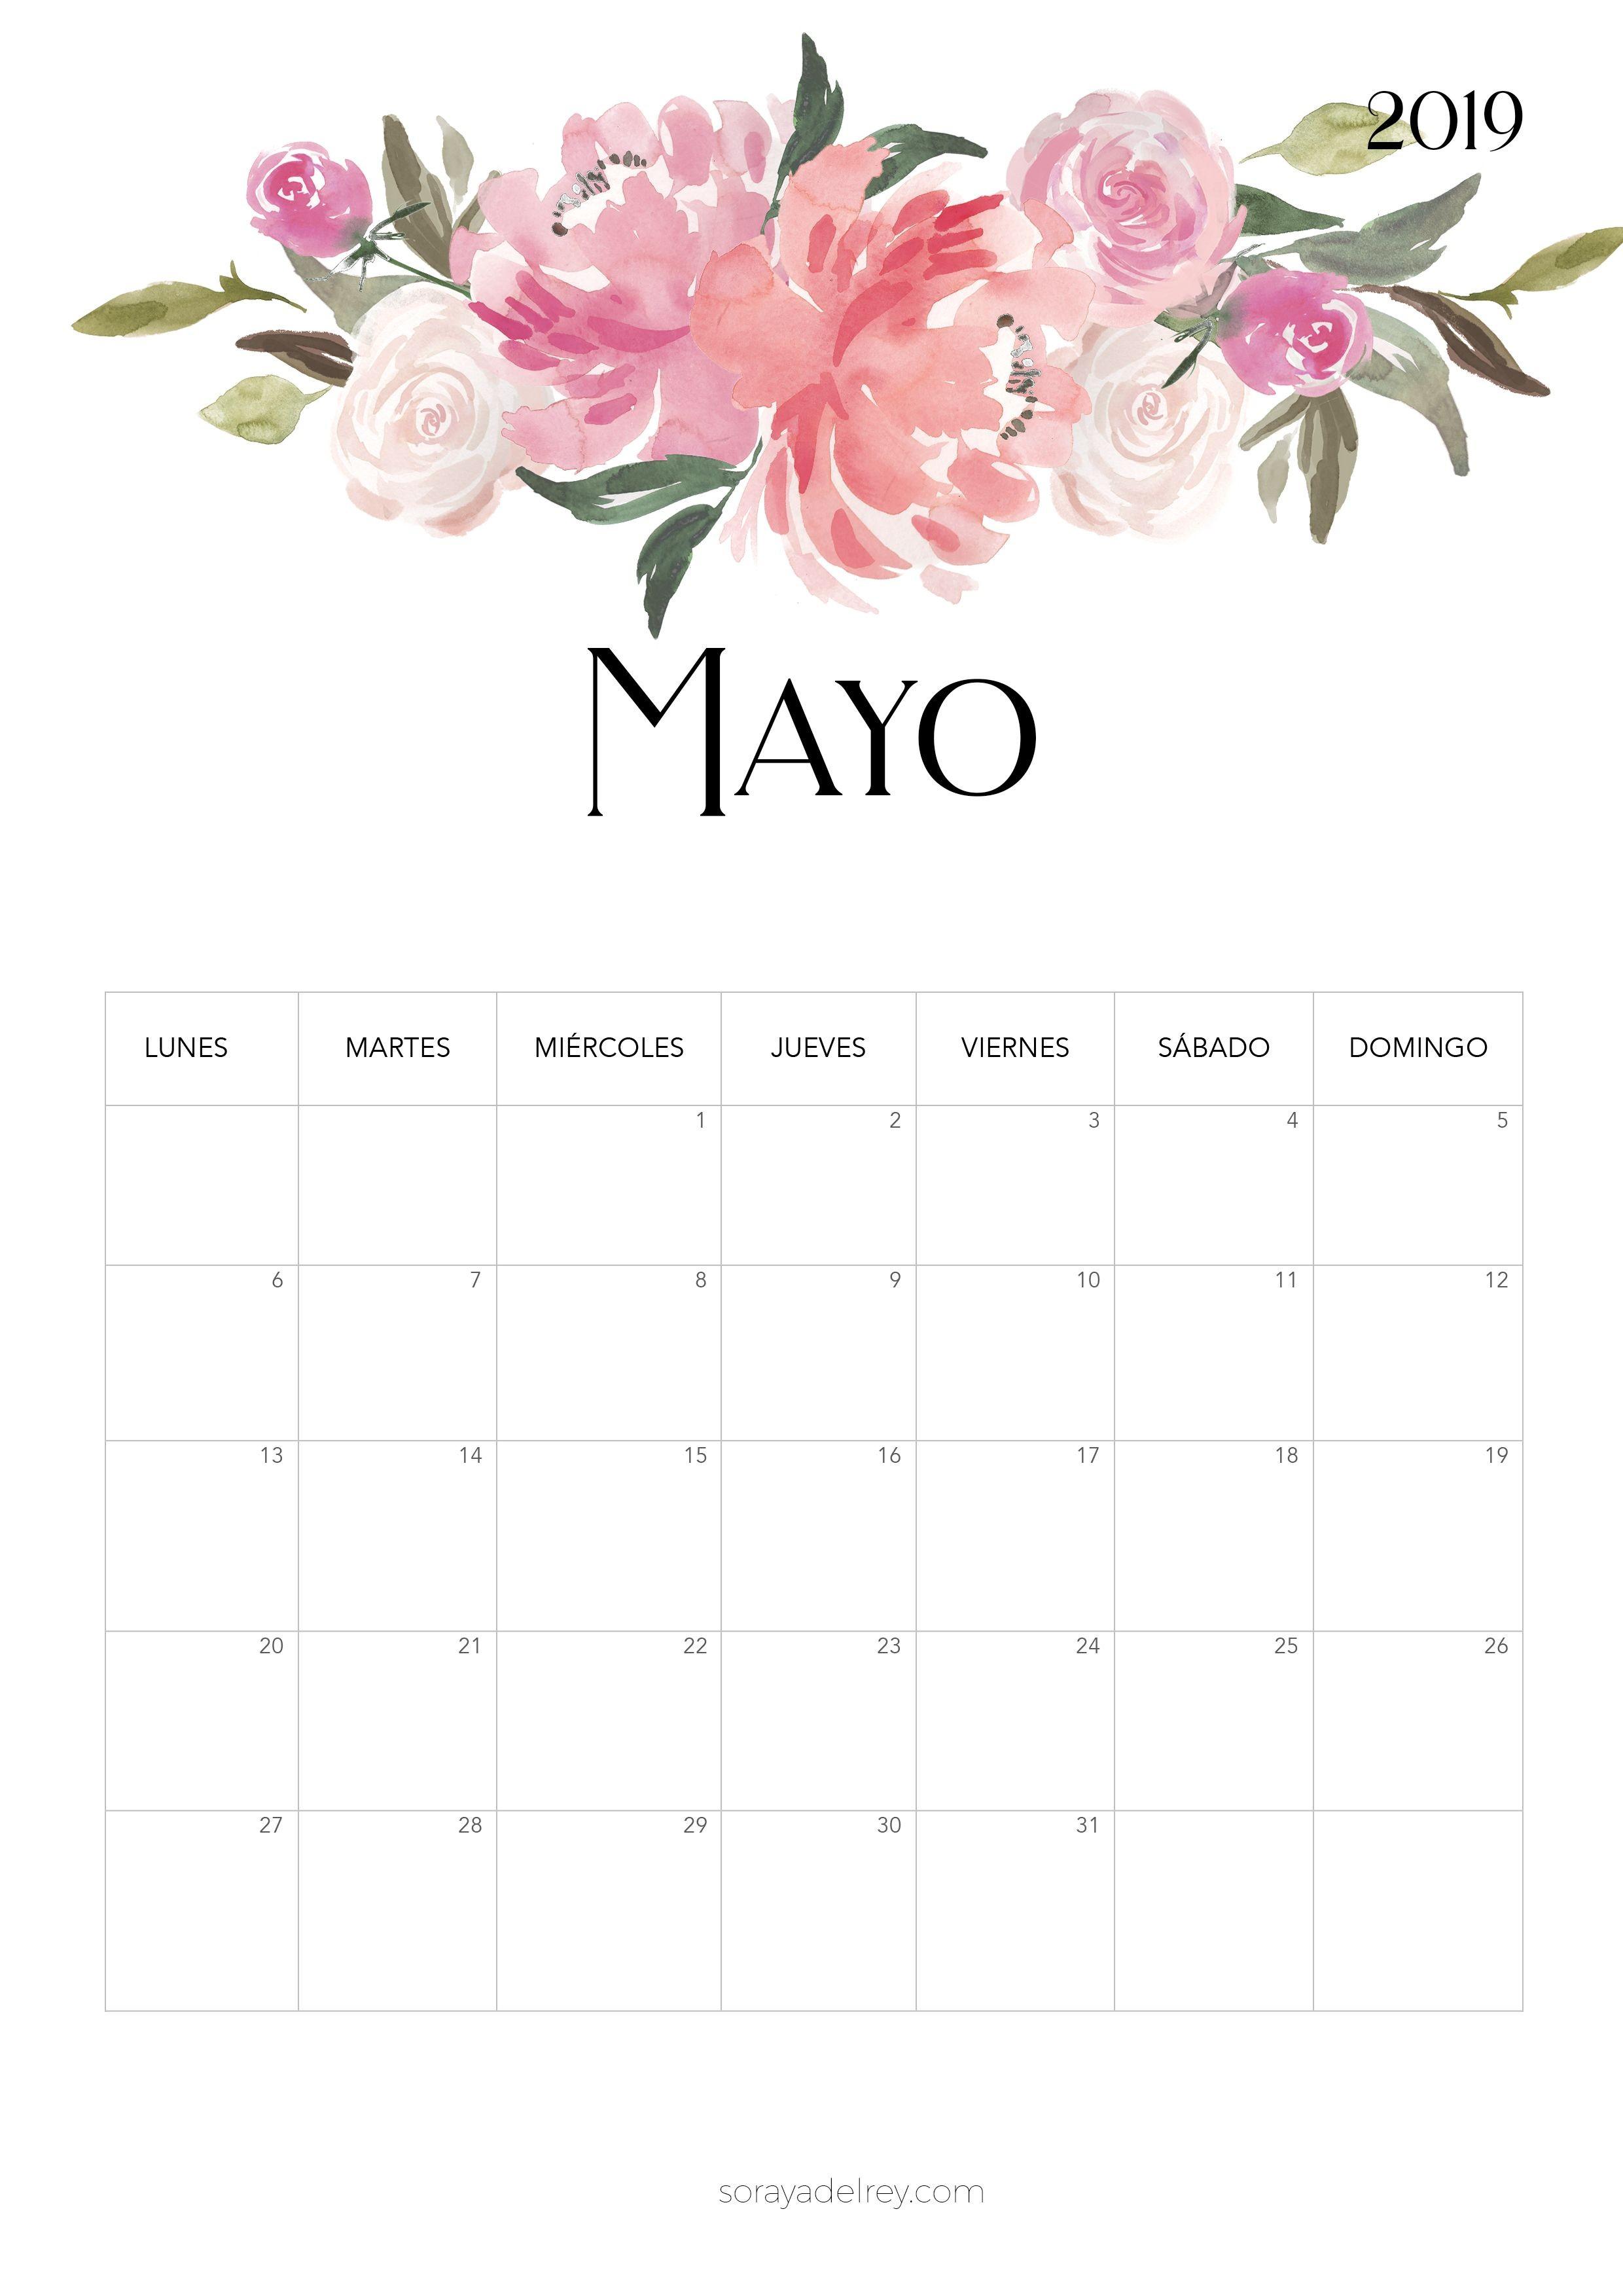 Calendario para imprimir Mayo 2019 calendario calendar mayo may freebie